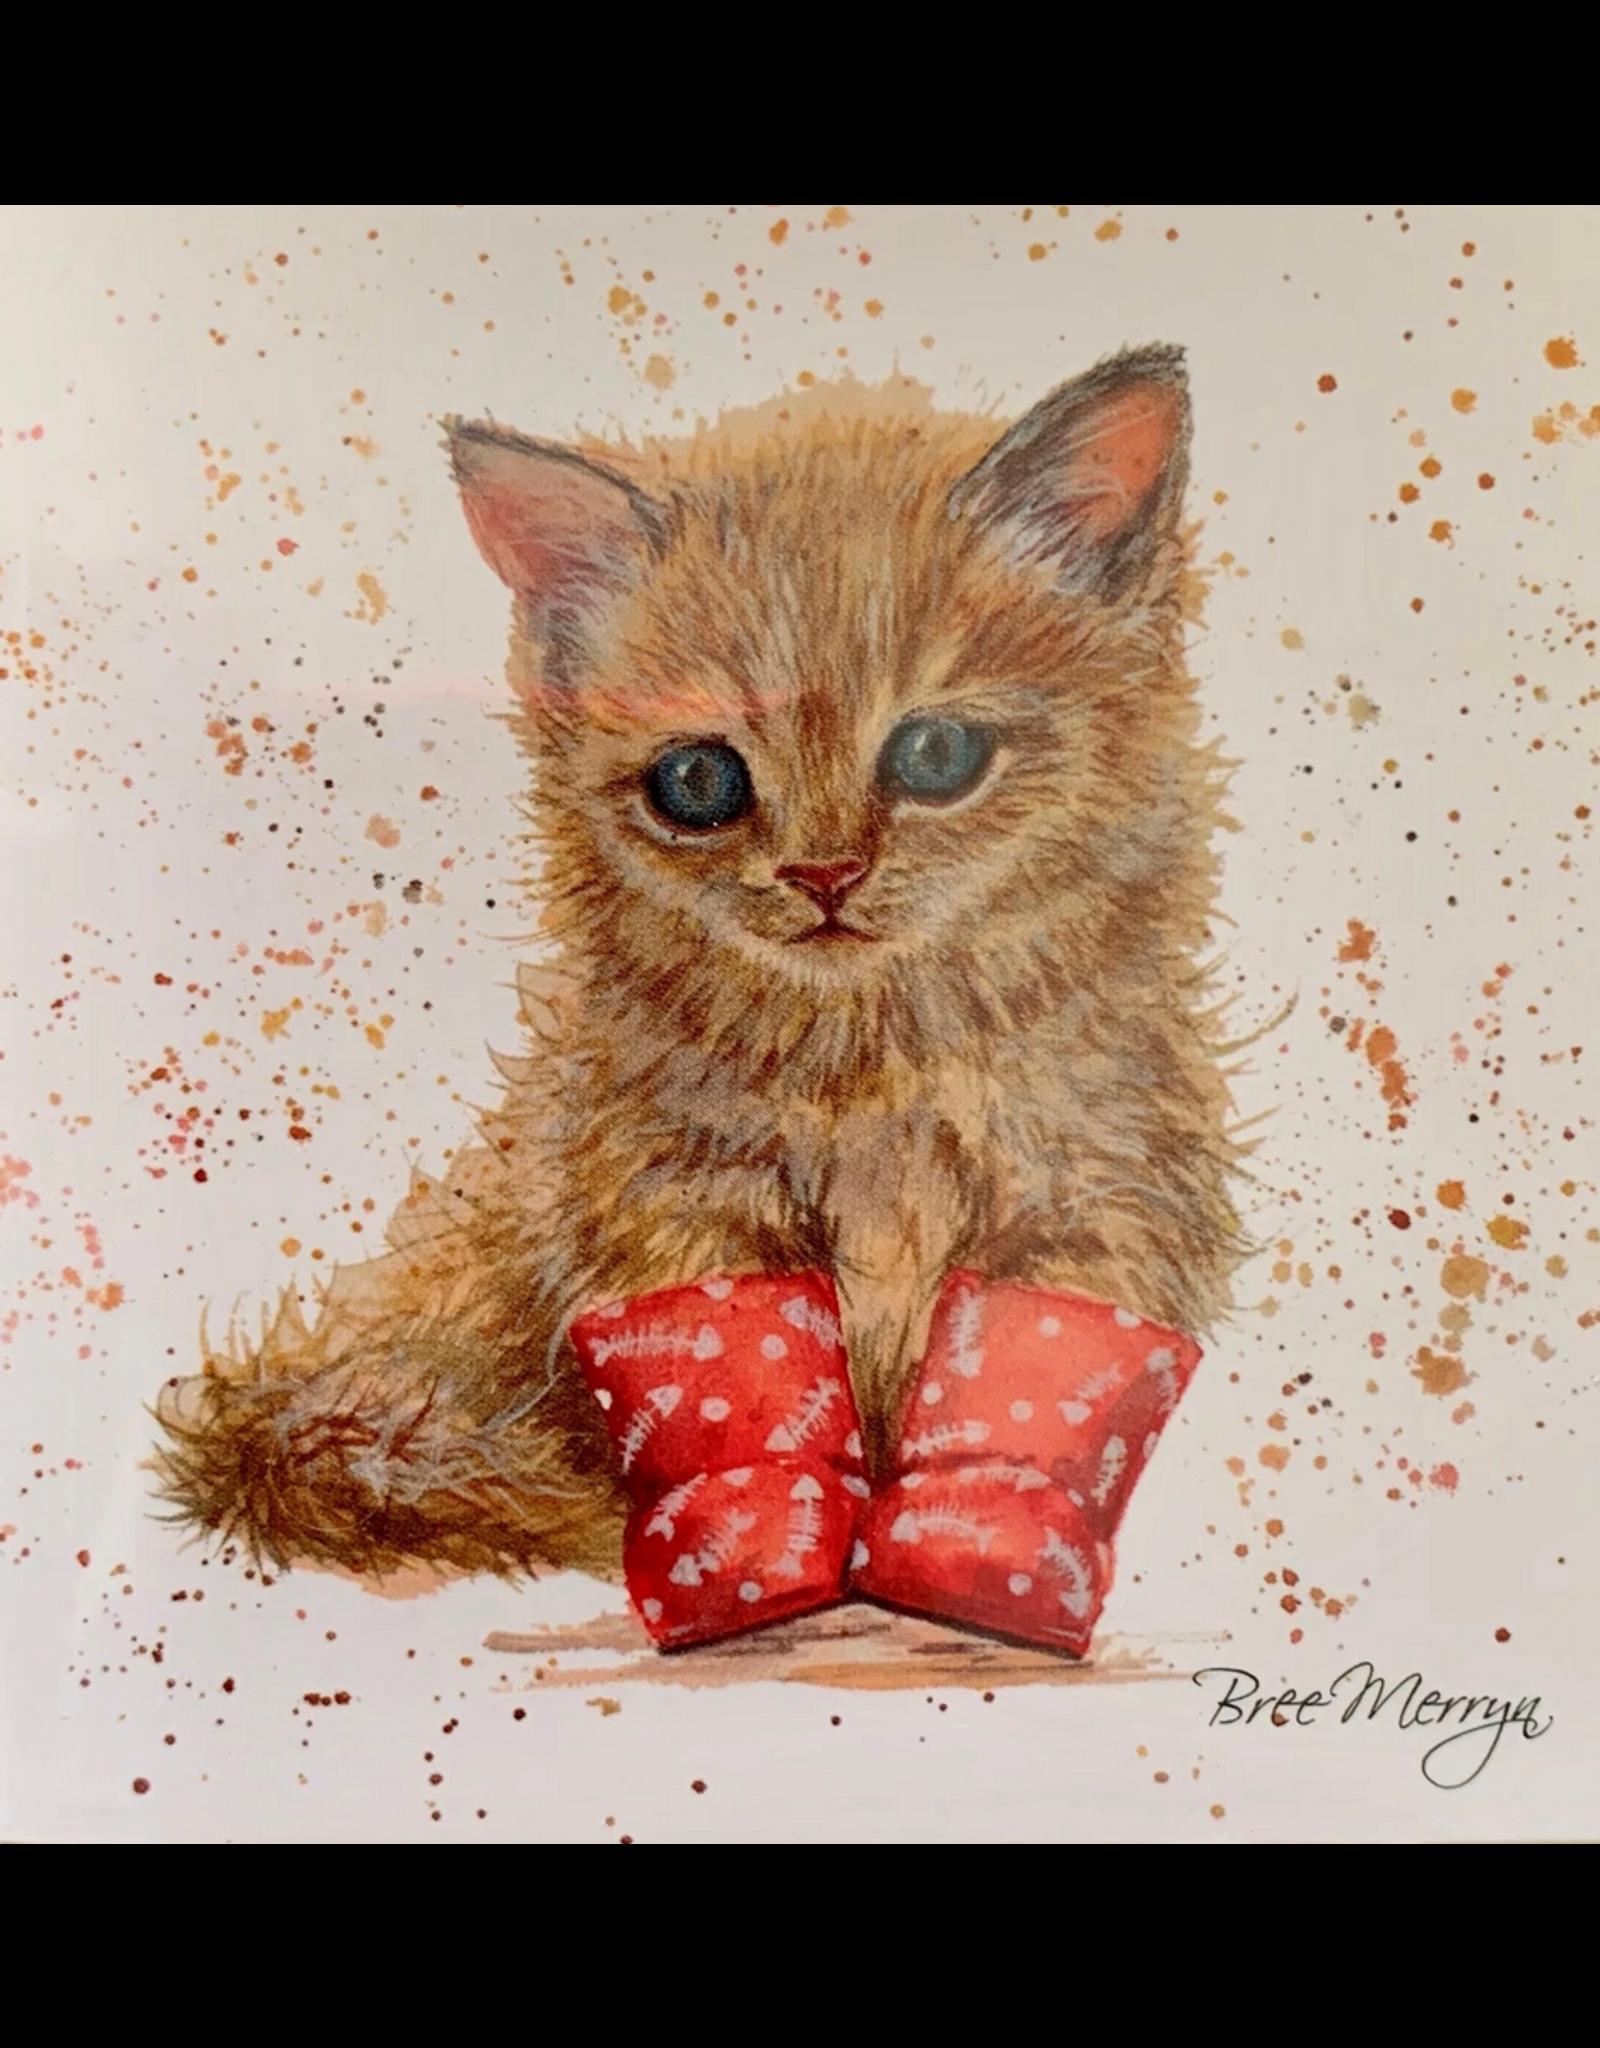 Bree Merryn Bree Merryn Baby Animal Gumboot Cards